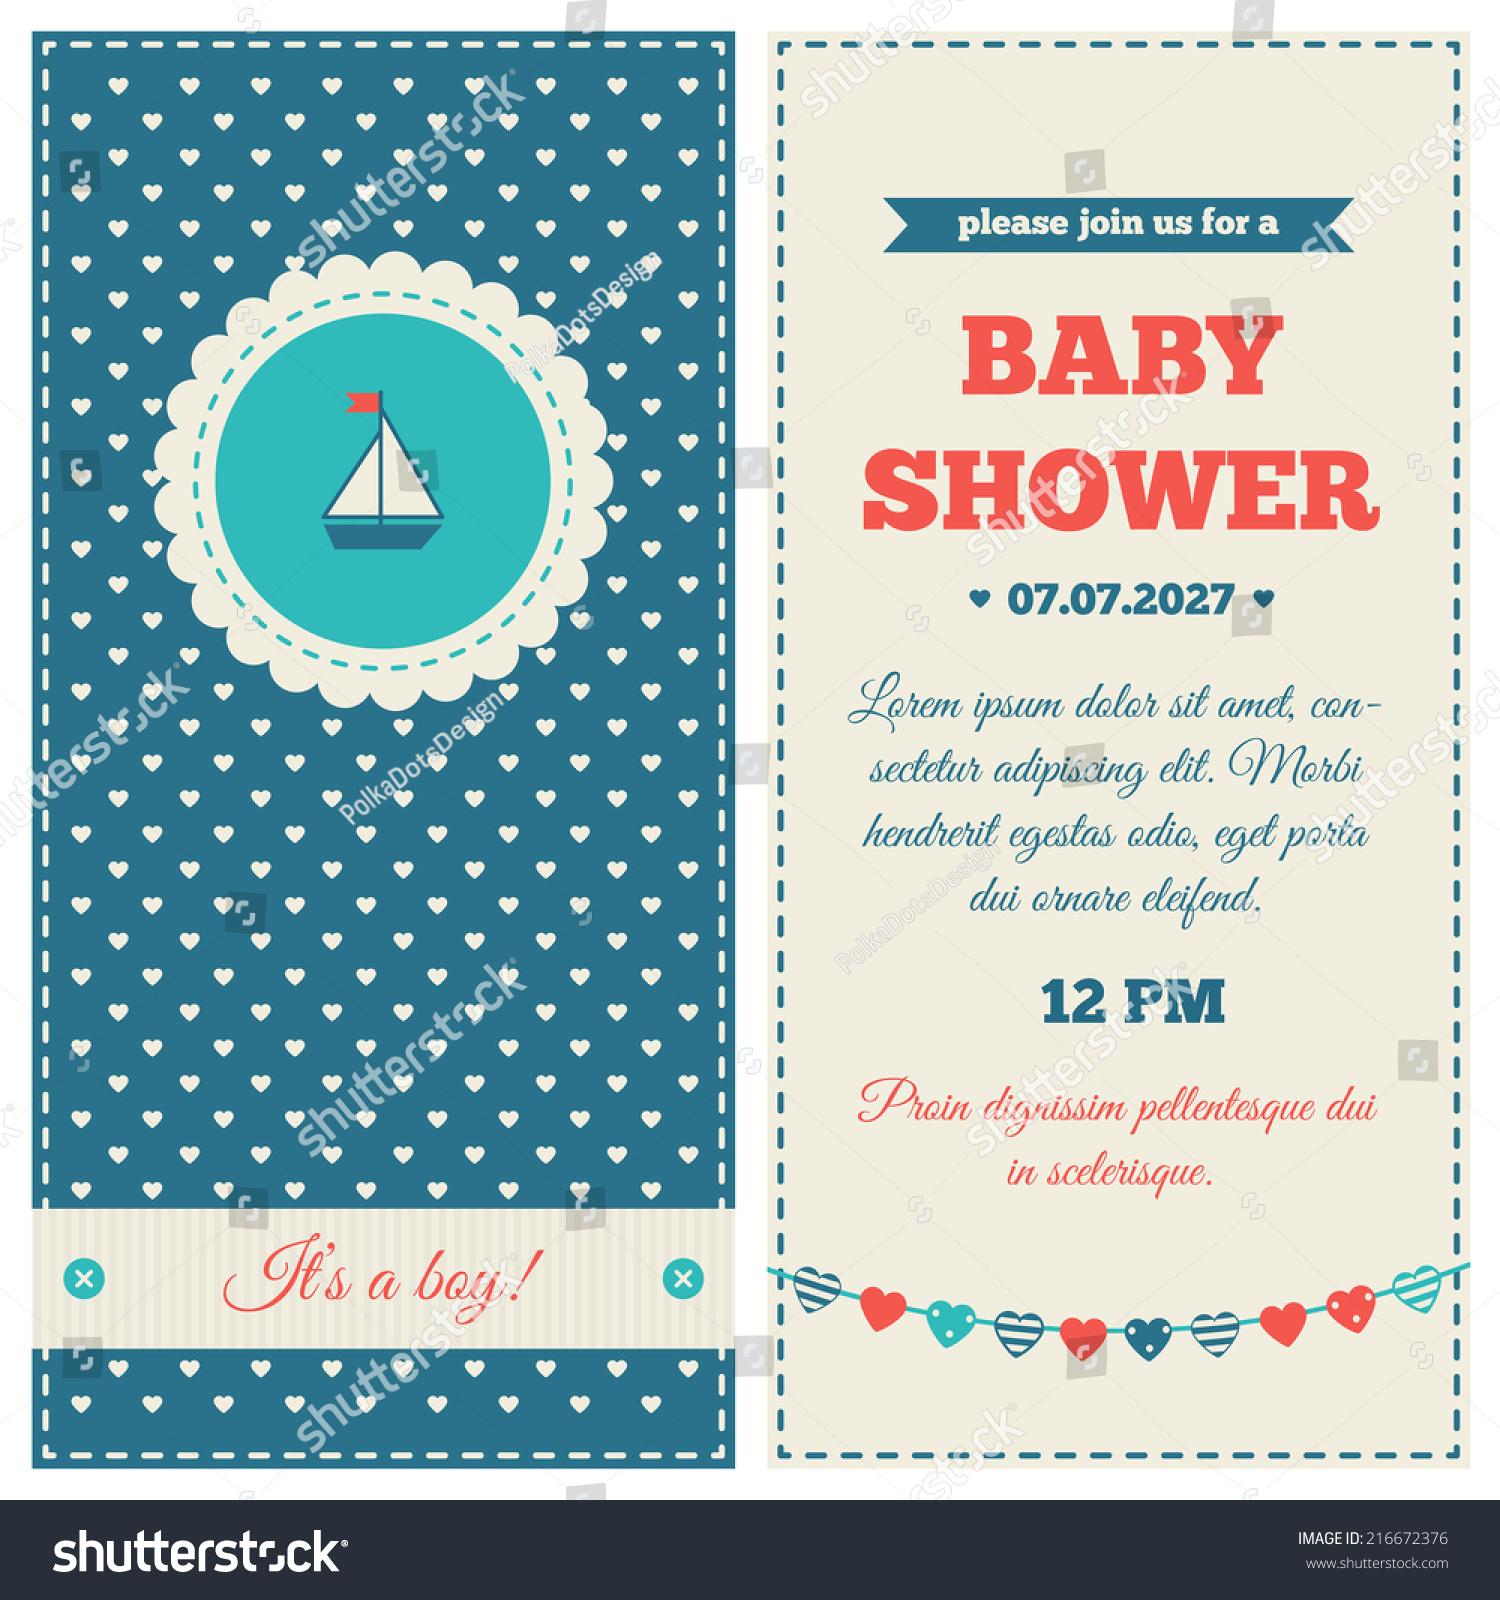 Baby Shower Invitation Marine Design Blue Stock Vector 216672376 ...